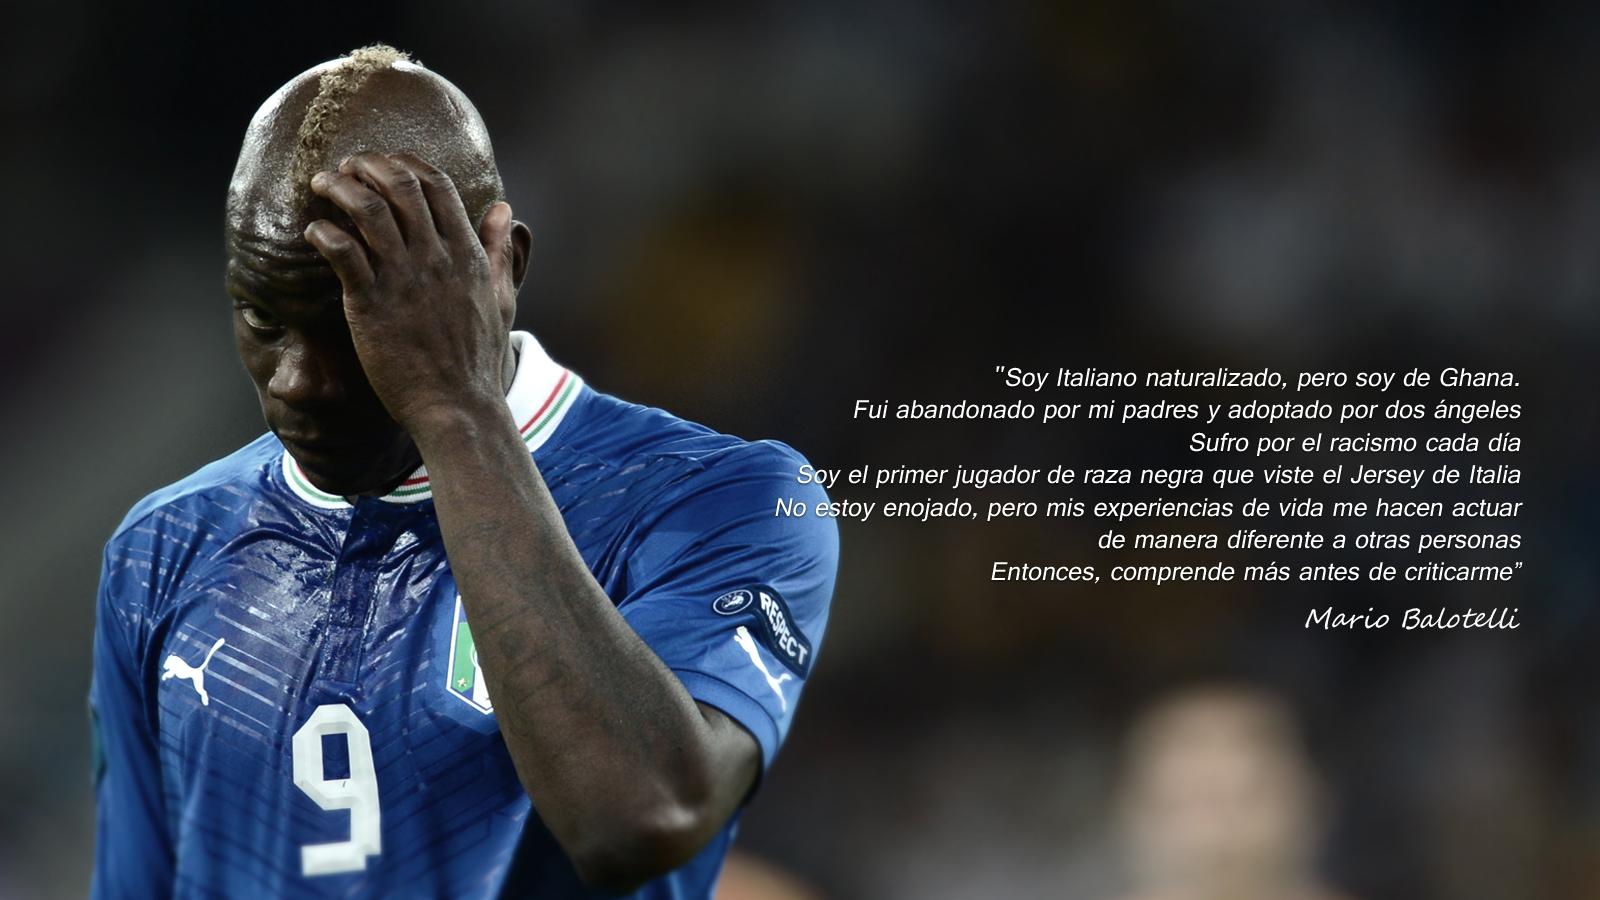 Mario Balotelli's quote #4